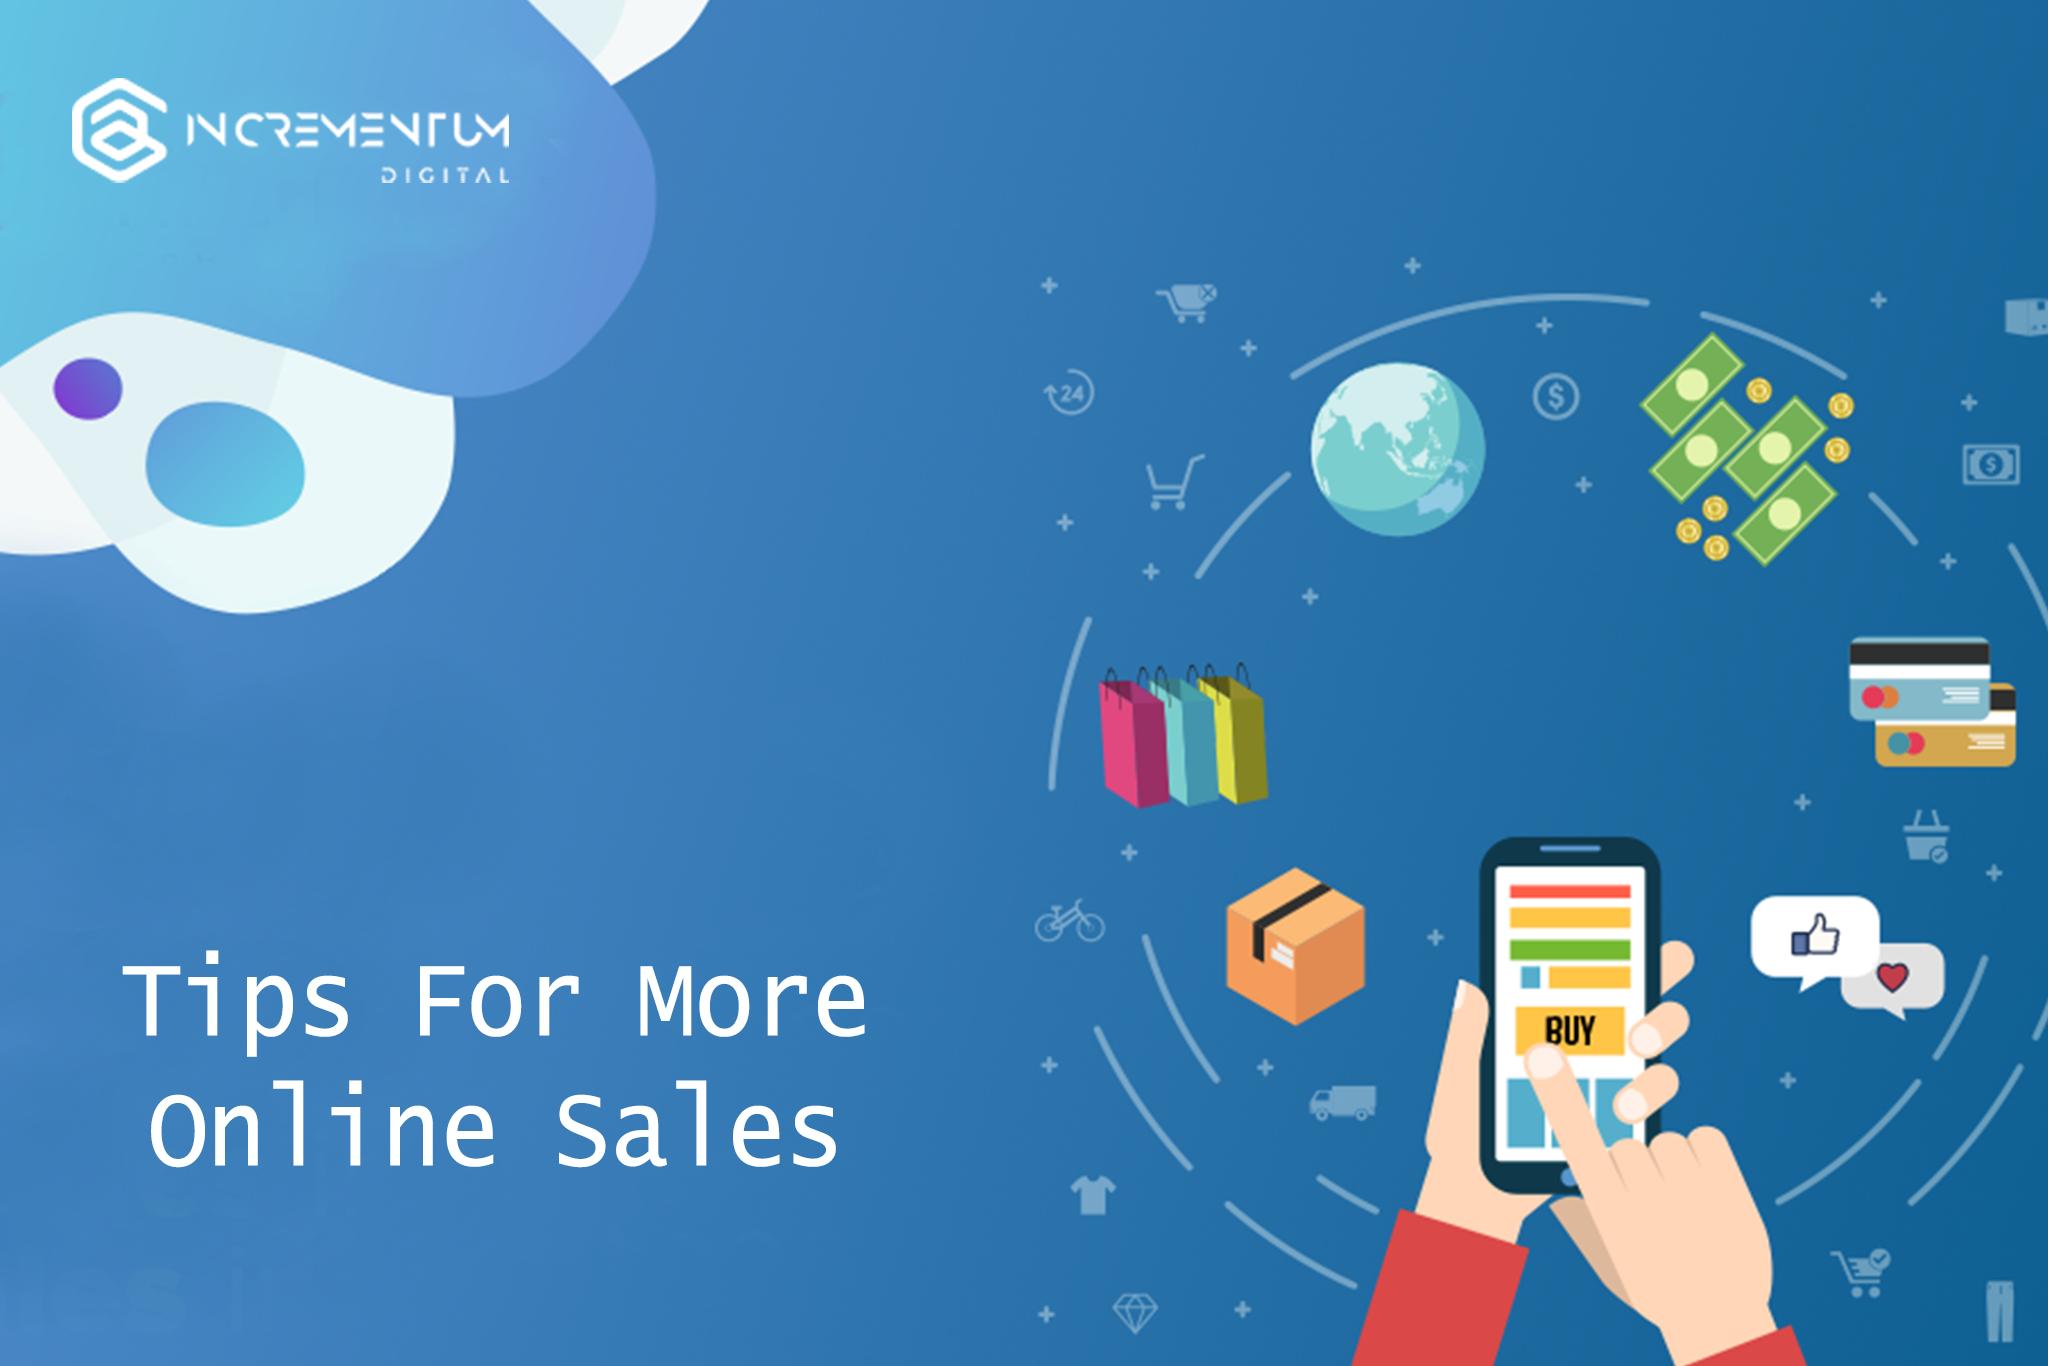 E-commerce Digital Marketing Tips for More Online Sales